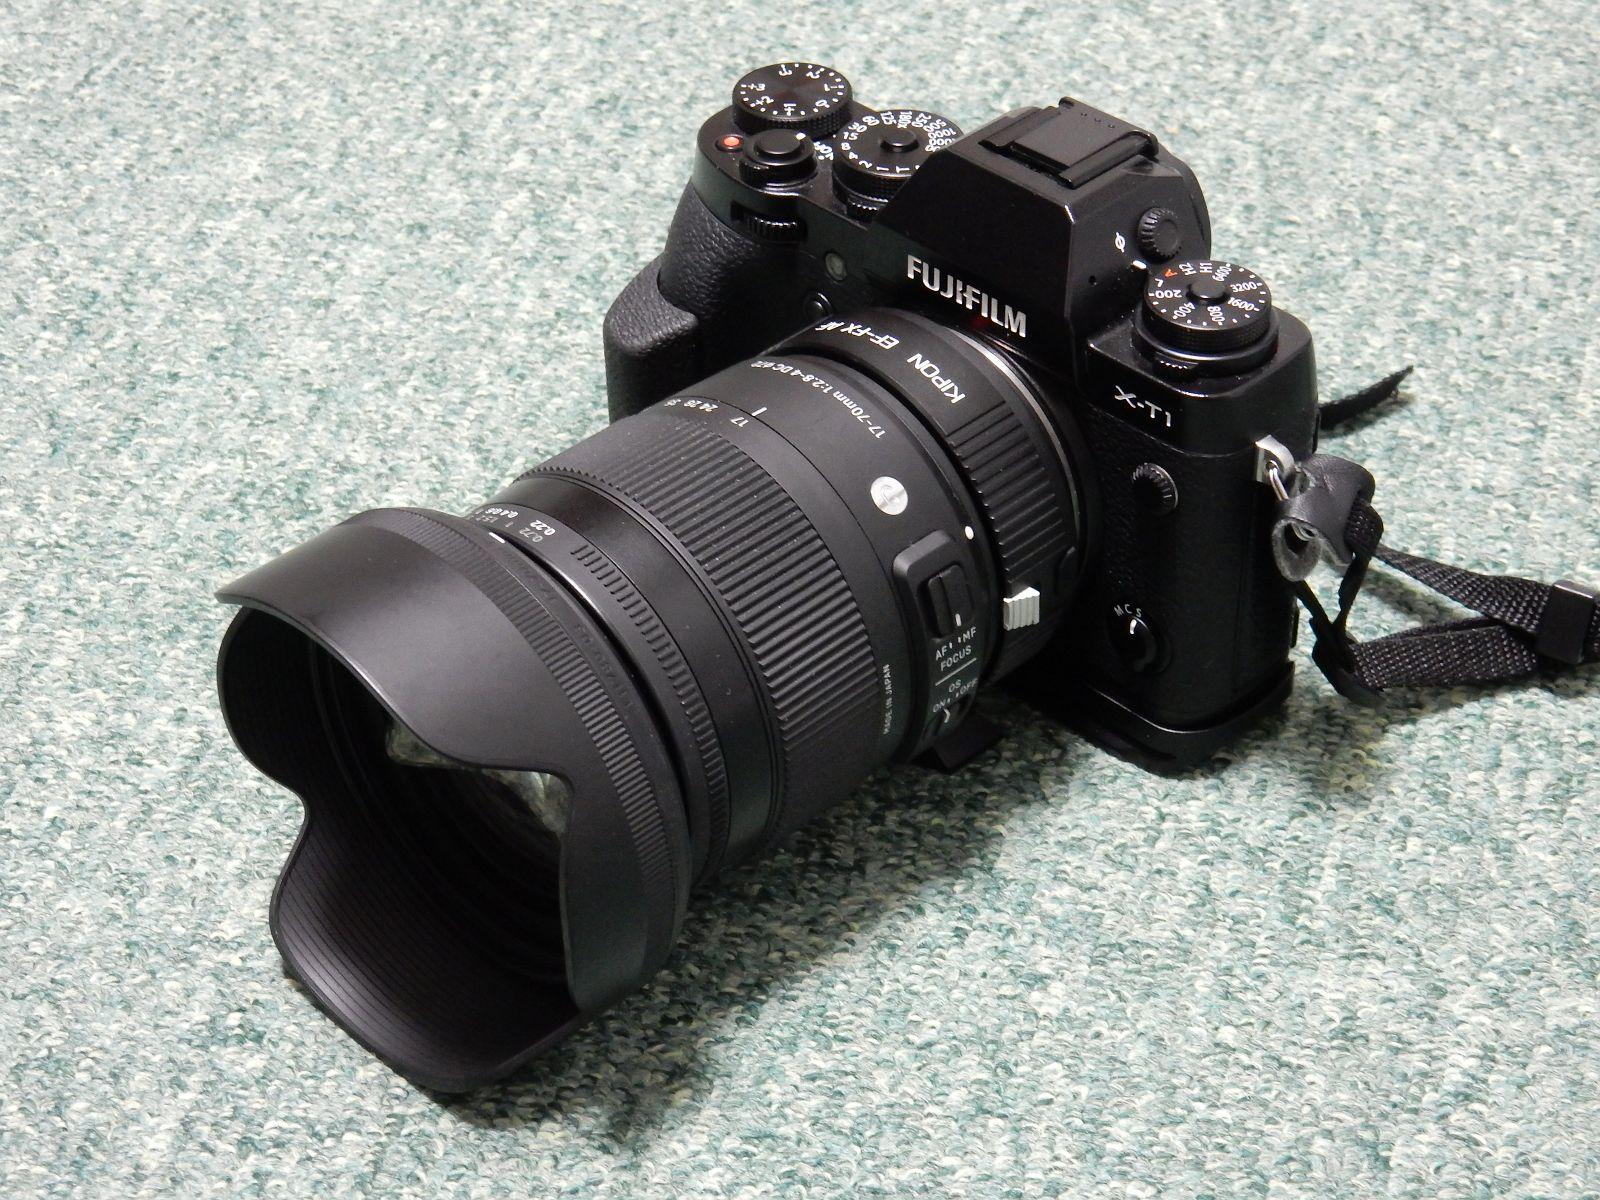 SIGMA 17-70mm F2.8-4 DC MACRO OS HSM + KIPON EF-FX AF with X-T1